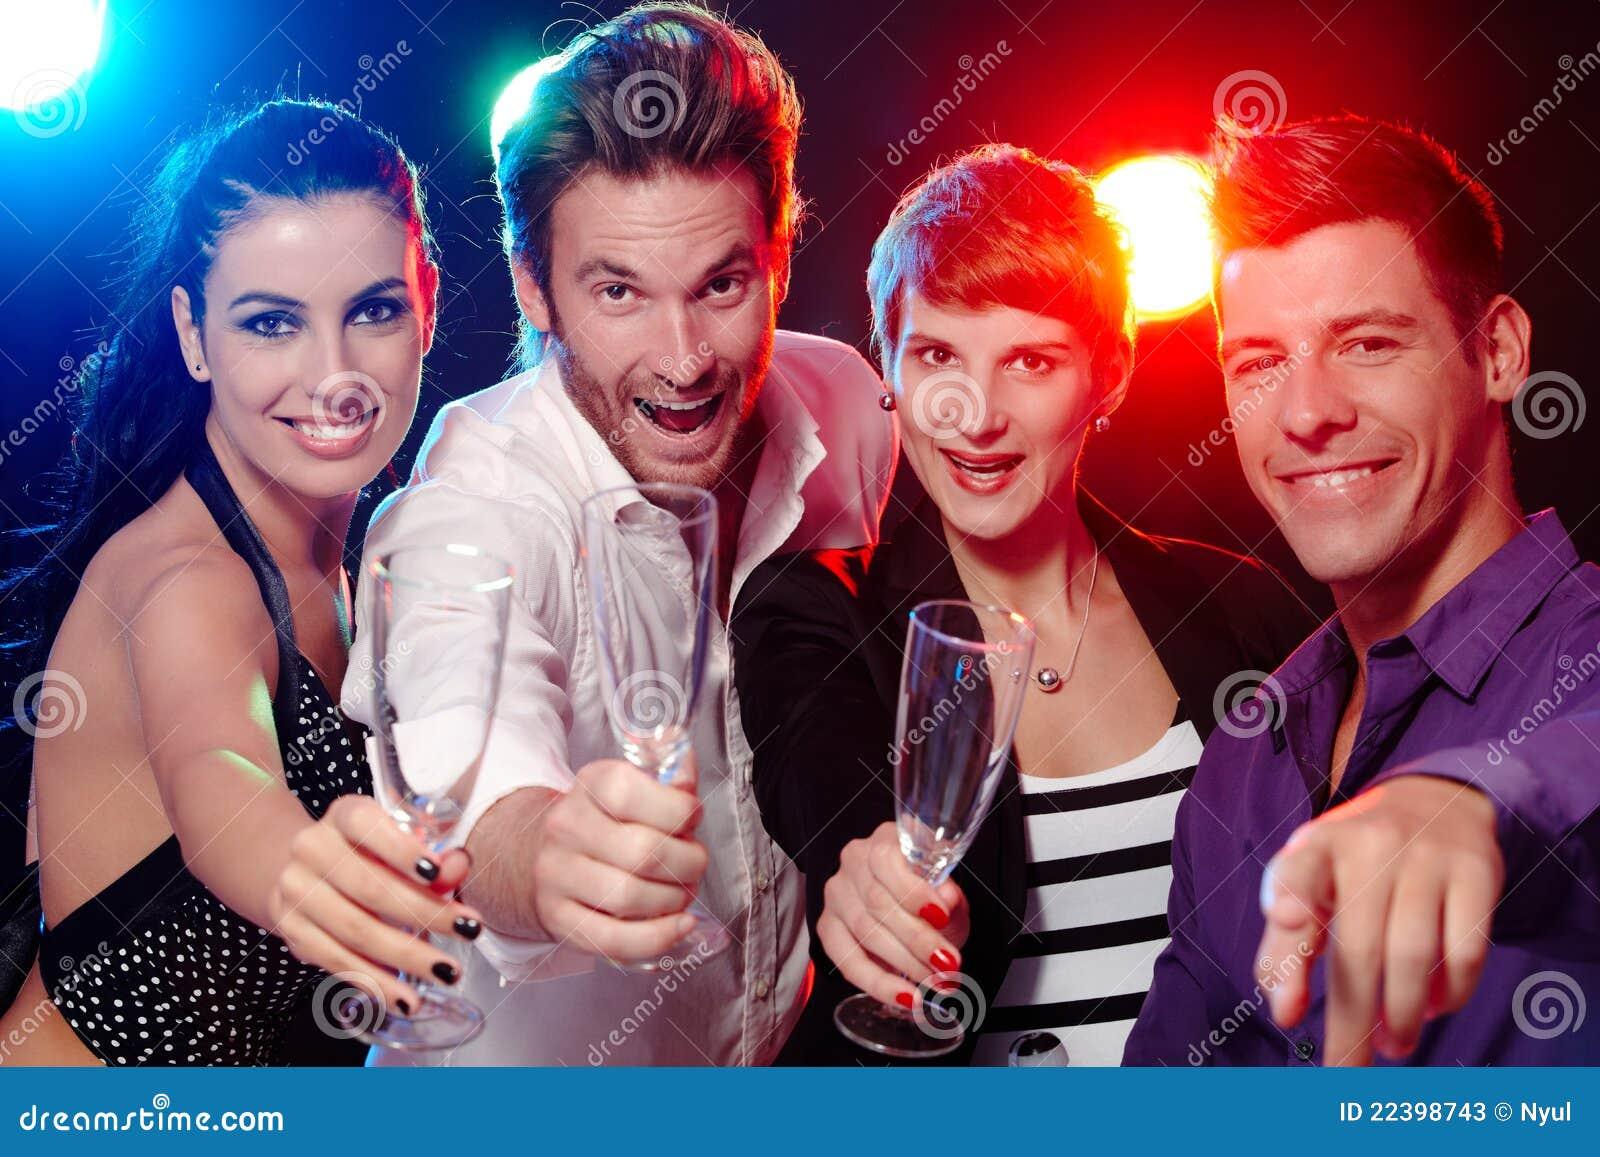 Young People Dancing In Club Or Disco, Men And Women Stock ...  |People Having Fun In A Club